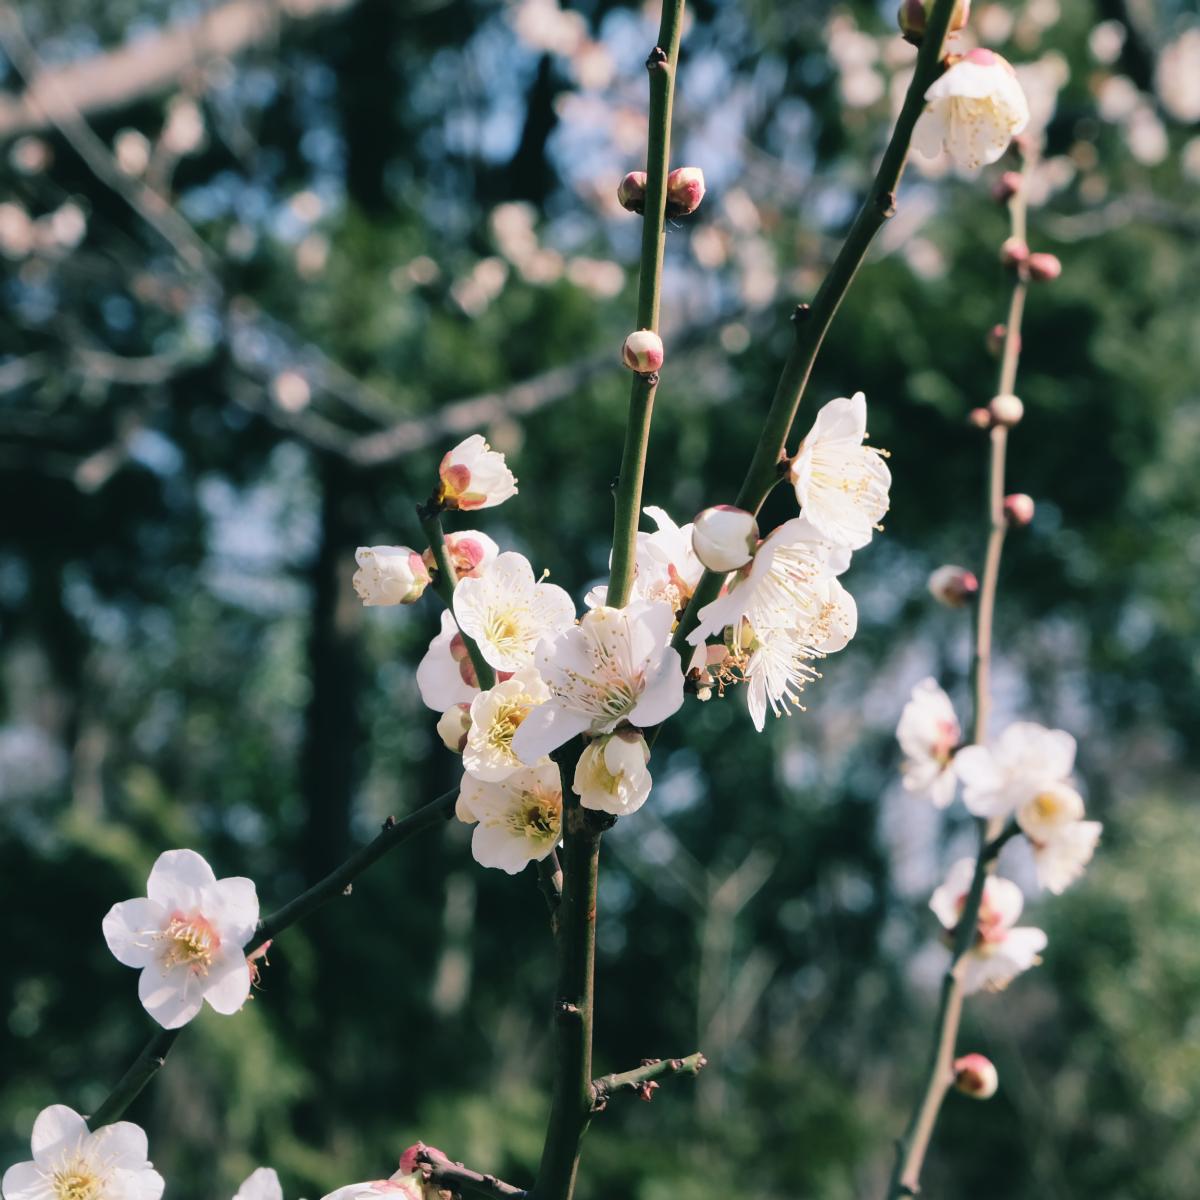 tokyo plum blossom viewing ume shimokitazawa 6